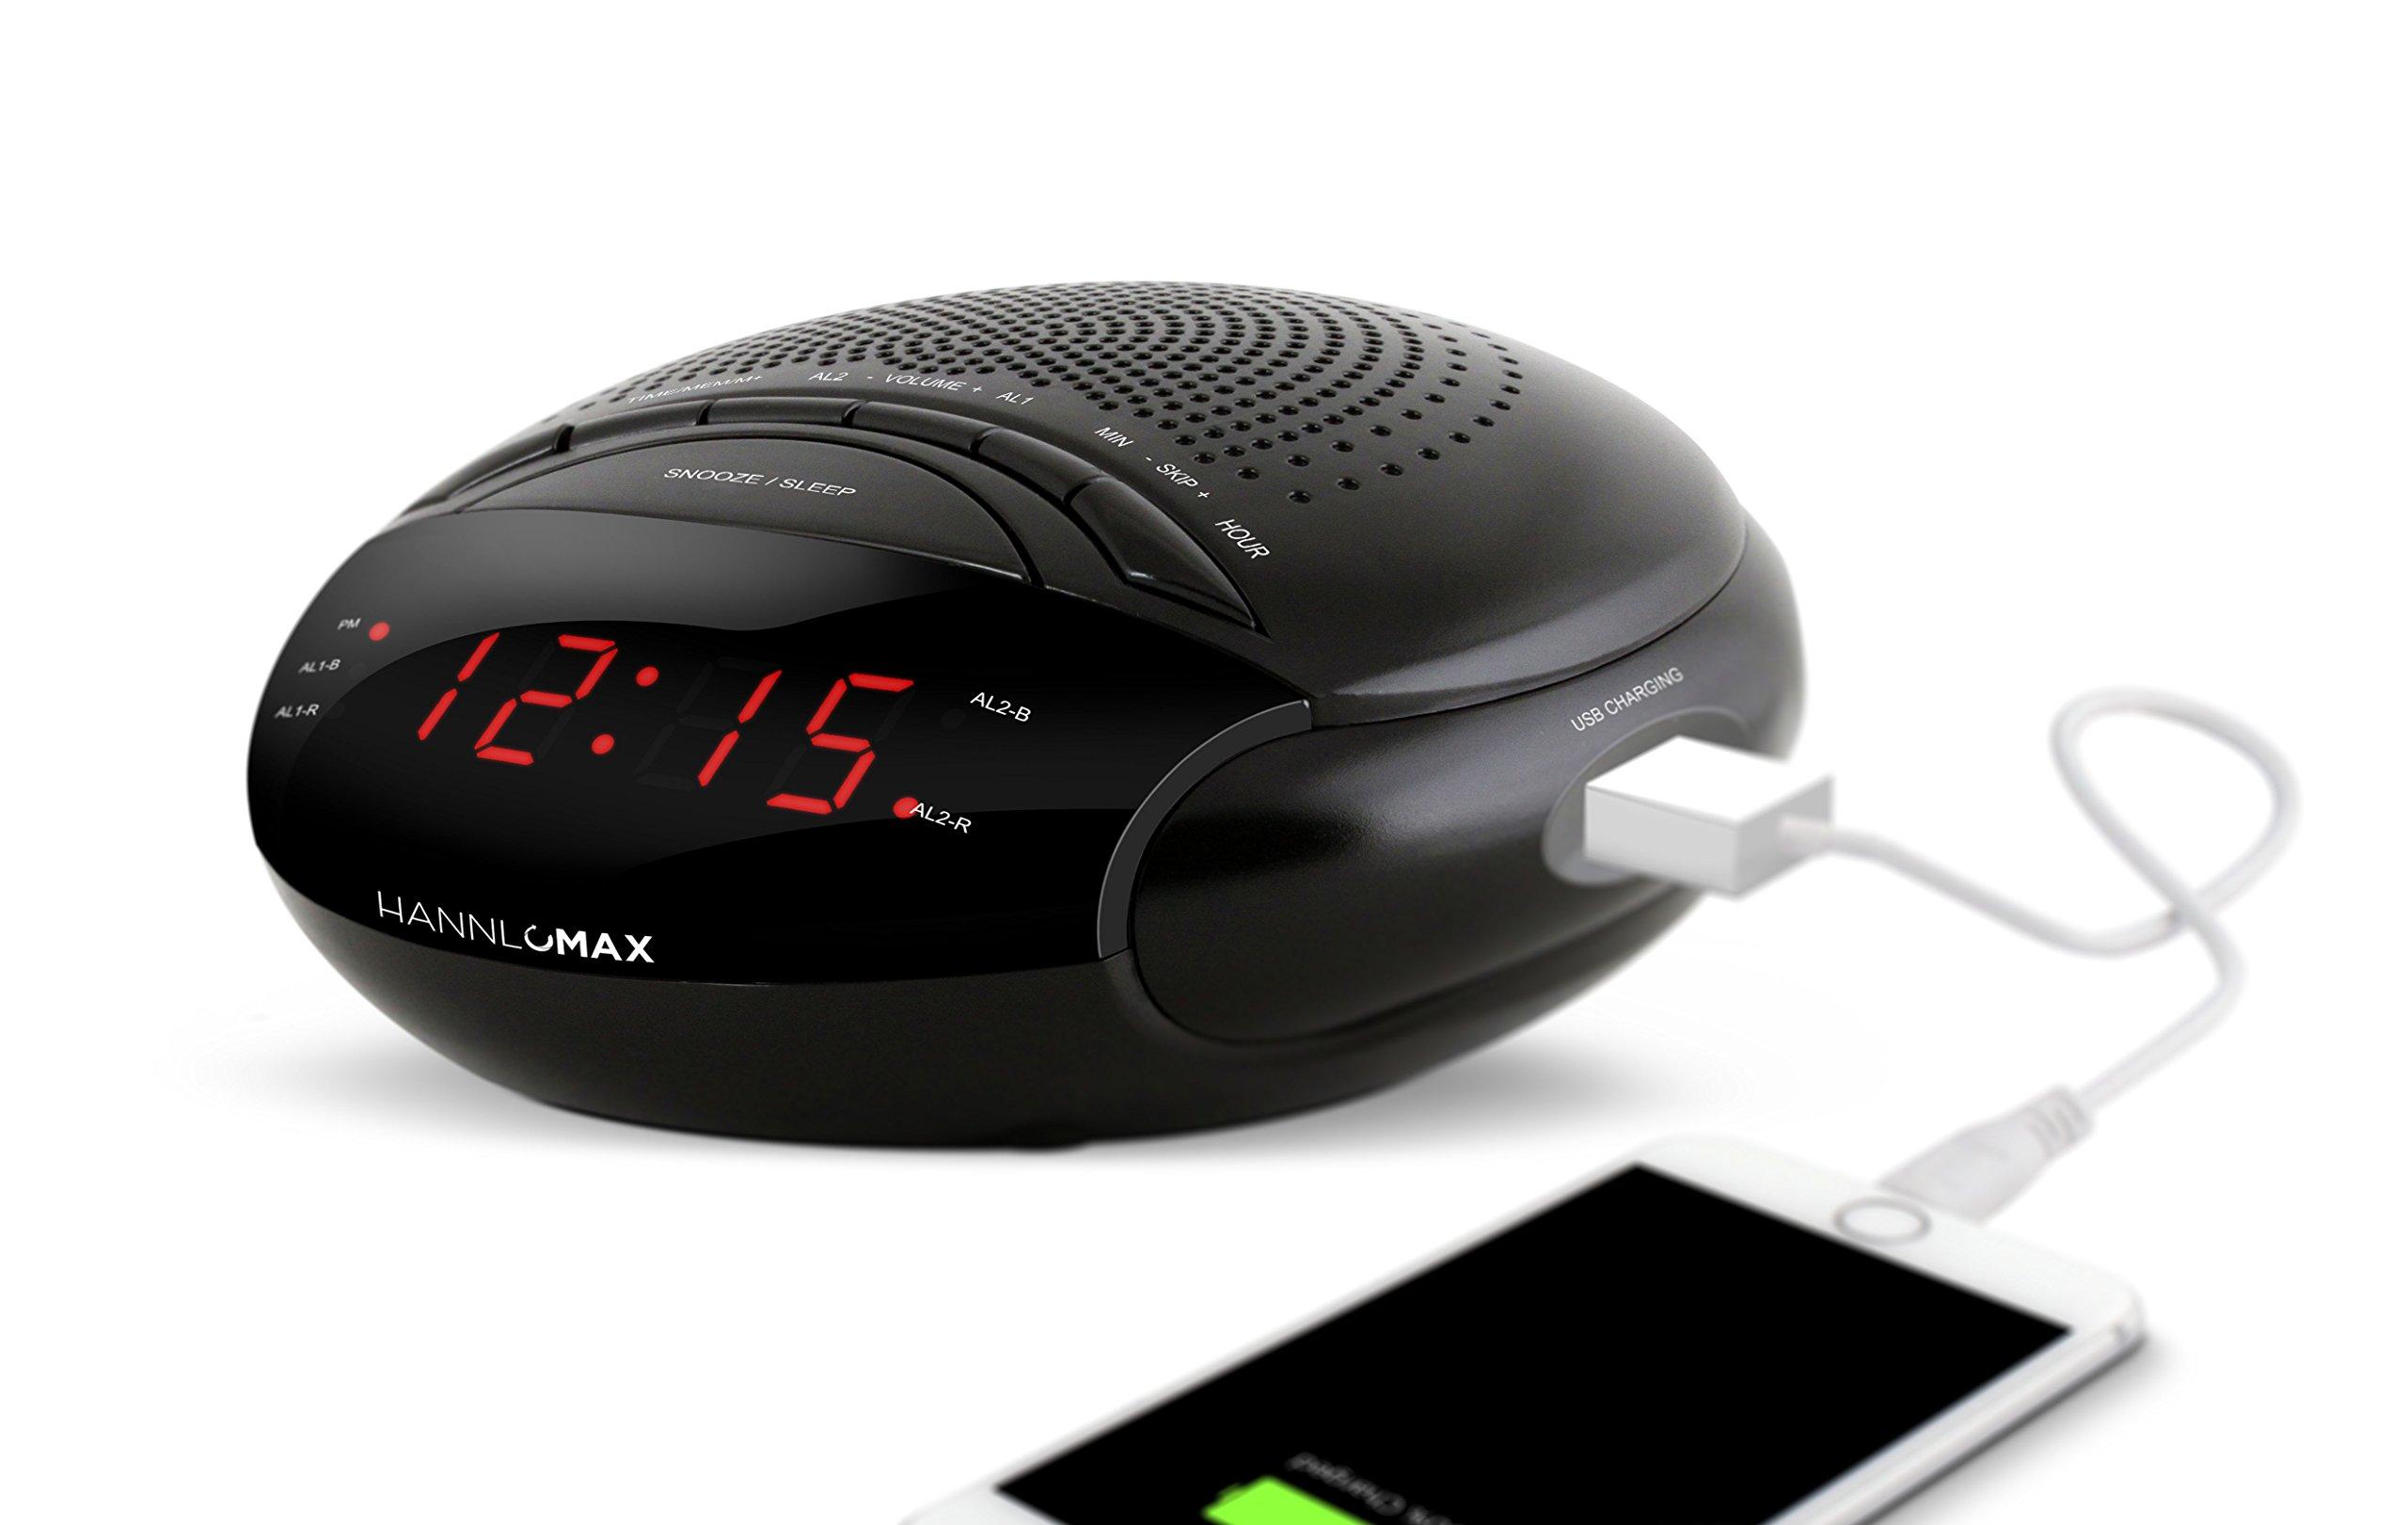 Hannlomax HX-200 Dual Alarm Clock Radio with USB Port for Charging, Sleep & Snooze Function, Electronic Volume